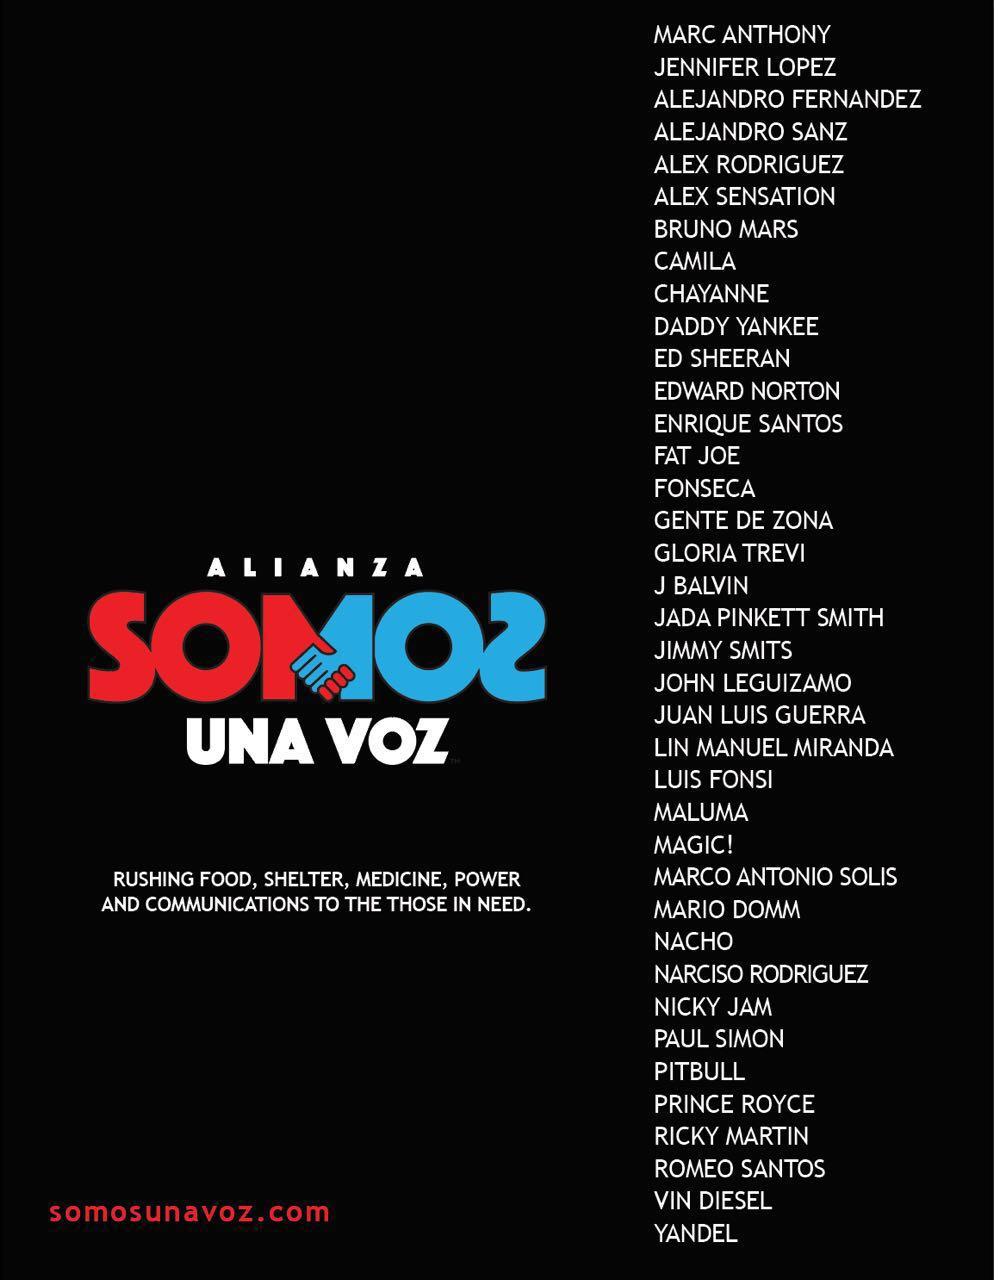 SOMOS UNA VOZ-Marc Anthony